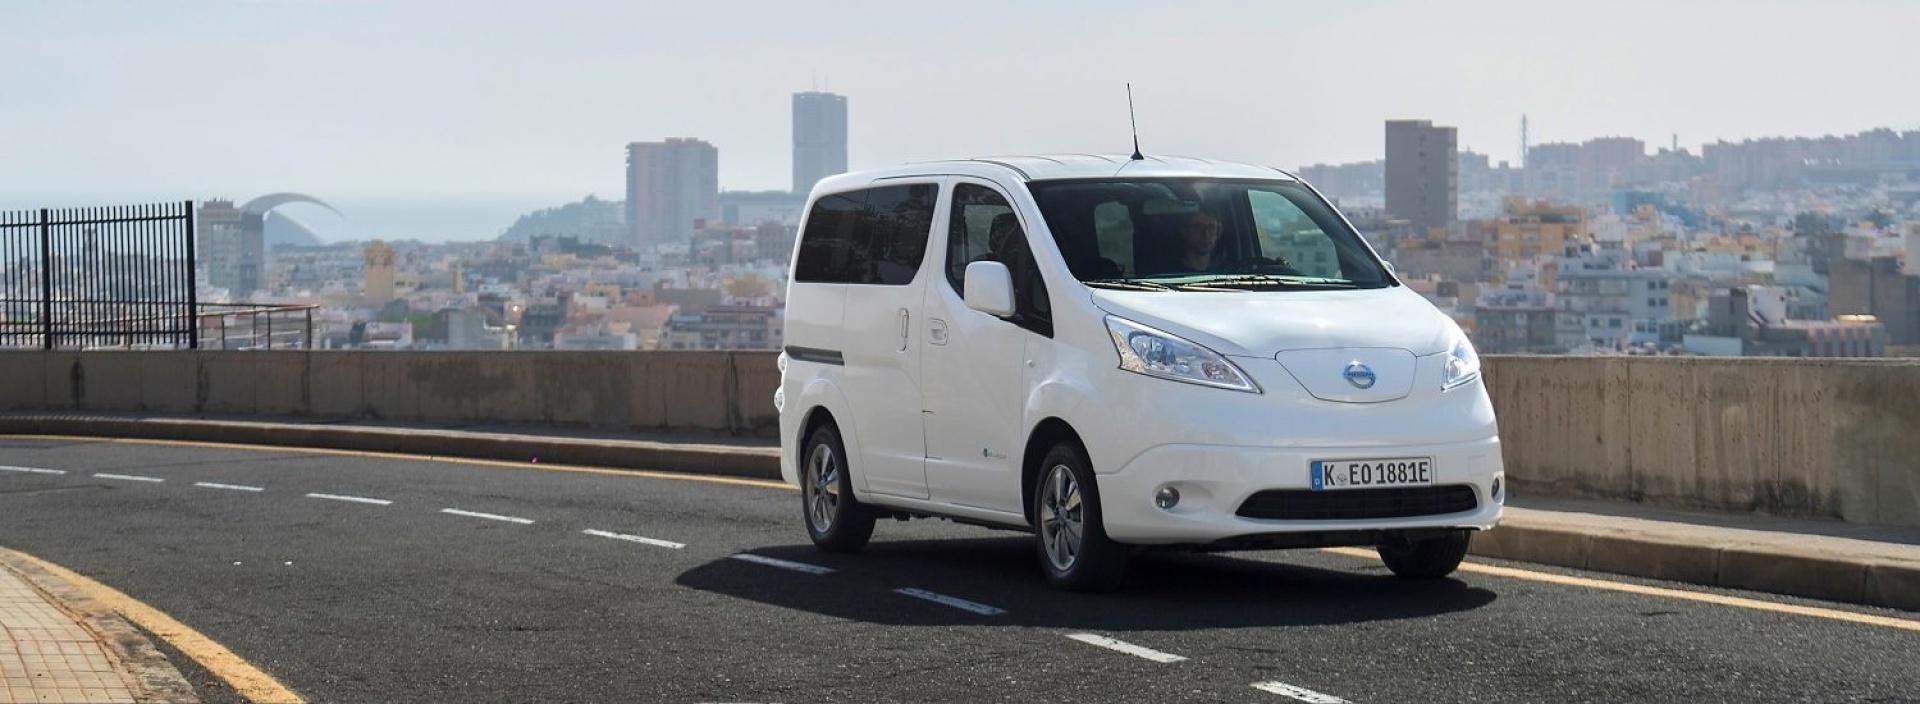 Nissan personenauto's-E-NV200 Evalia-banner